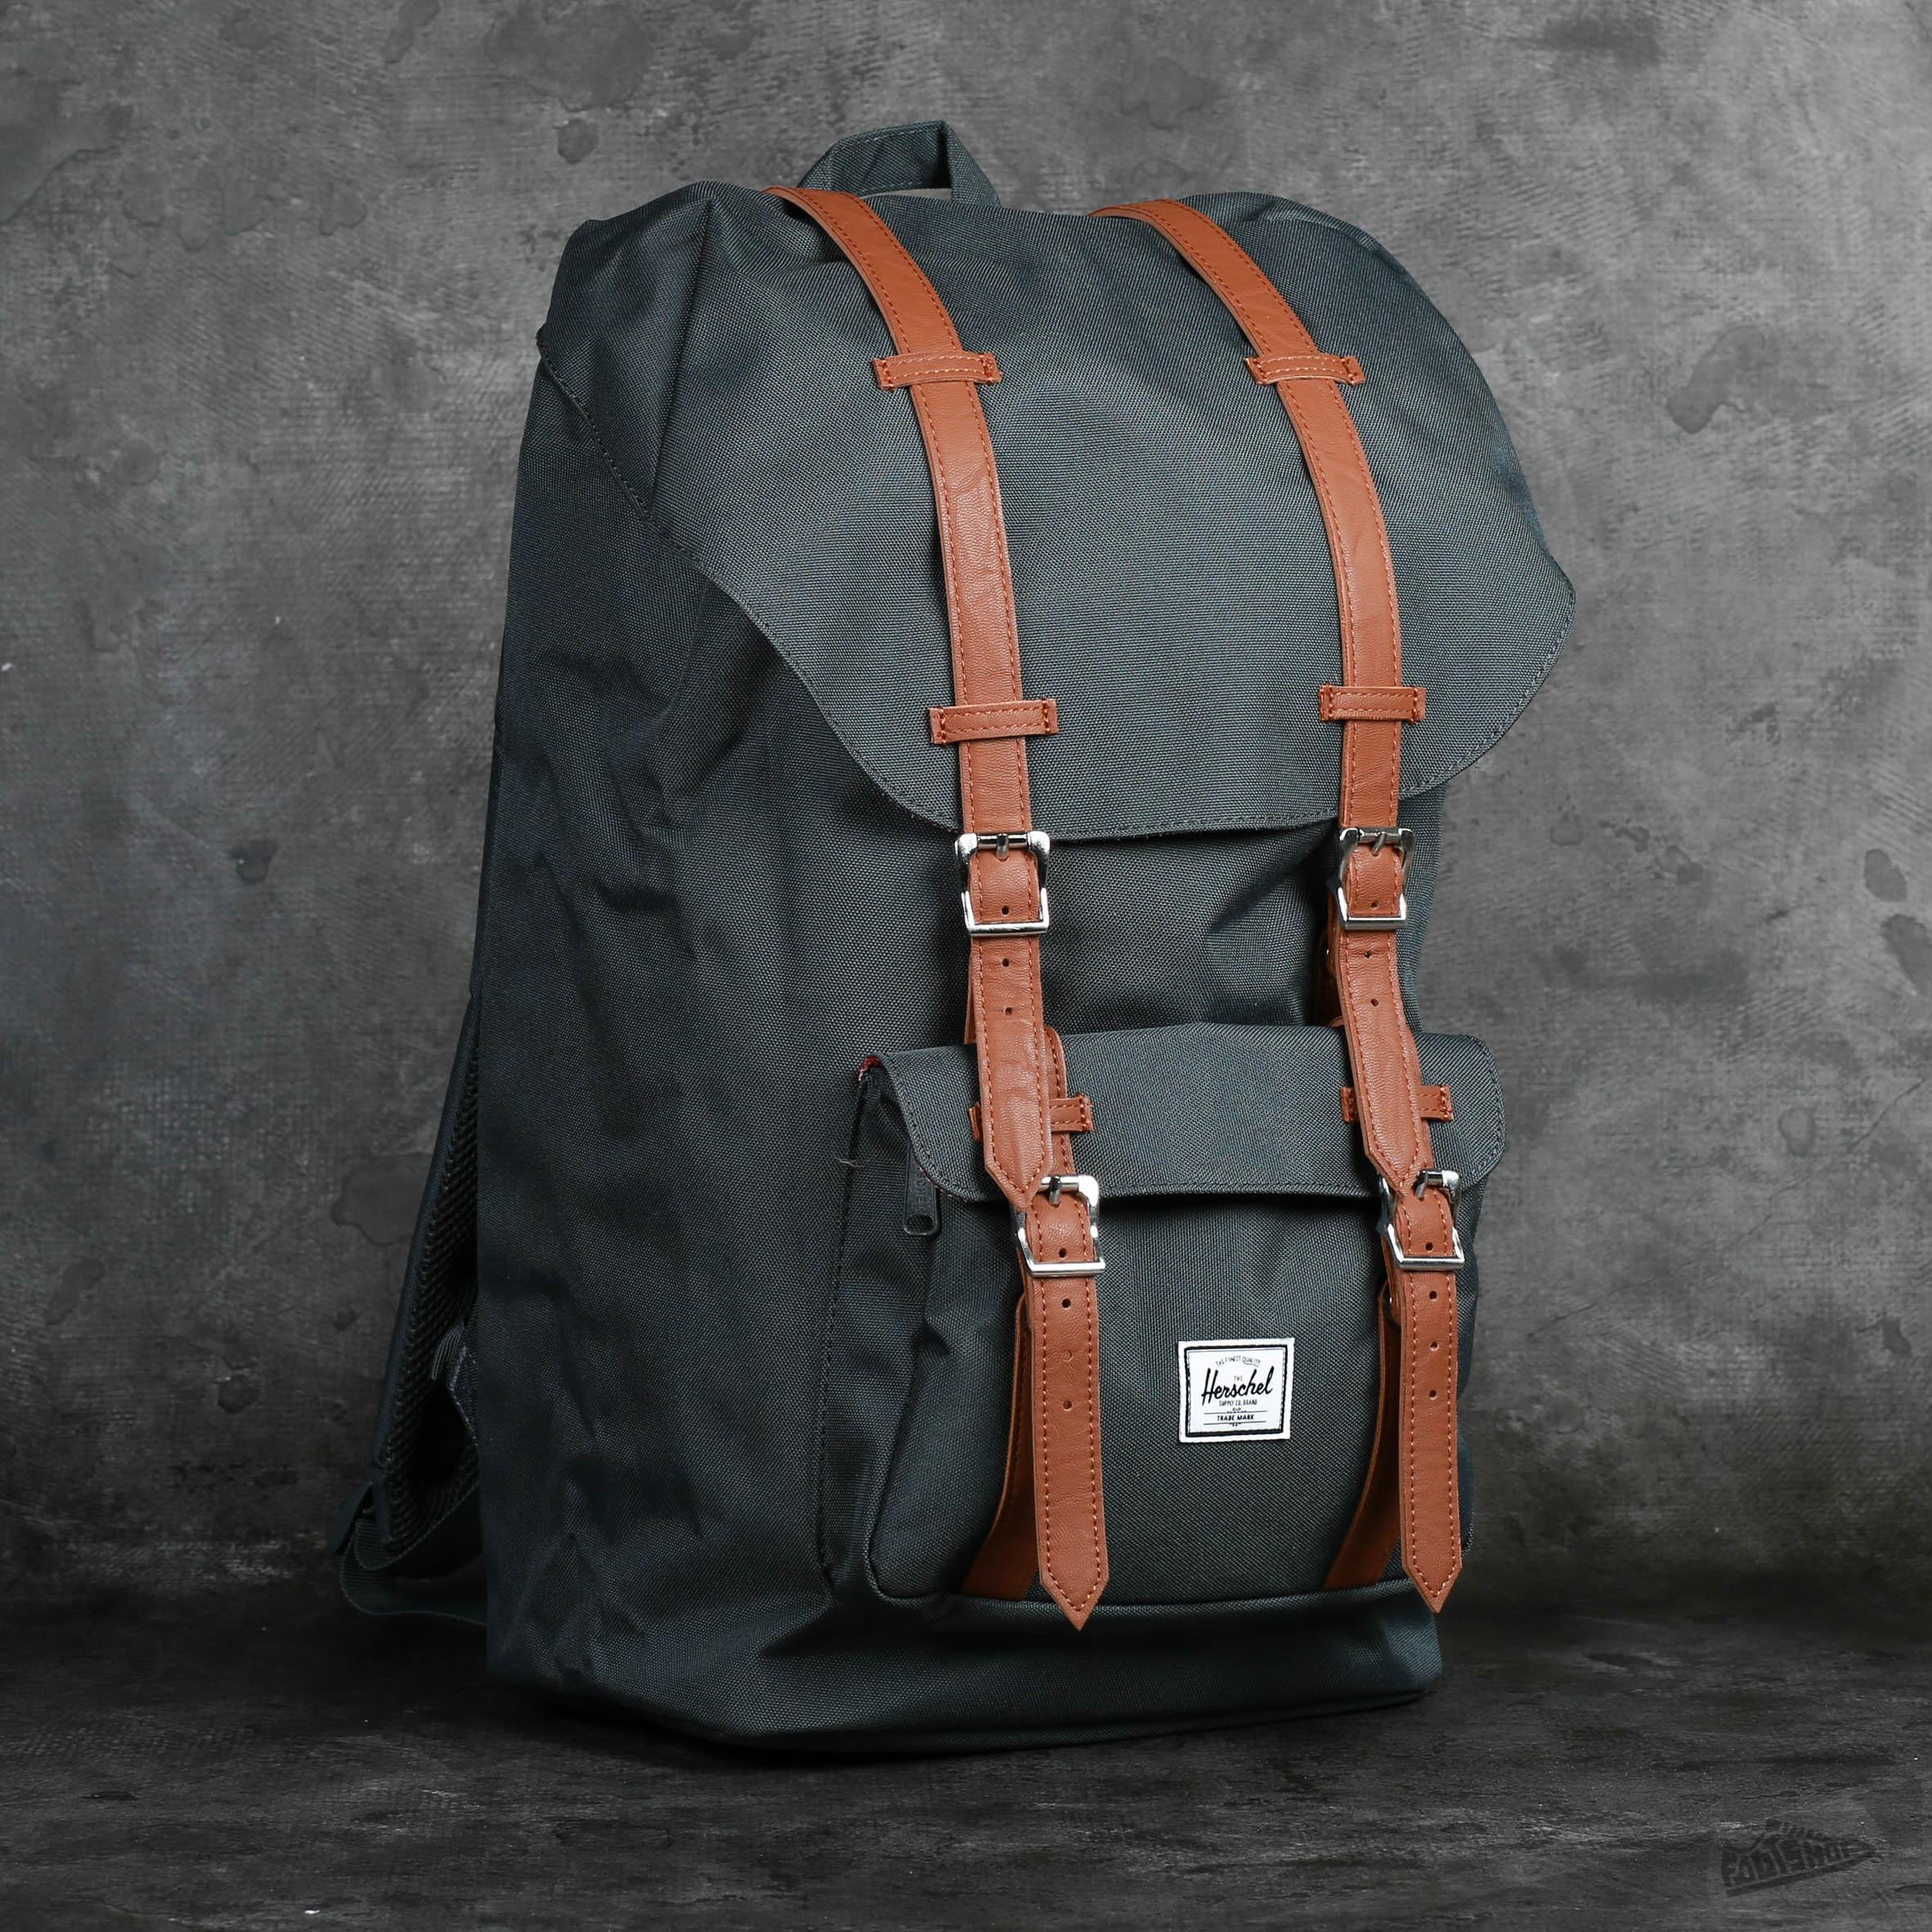 0821ebadf1 Herschel Supply Co. Little America Backpack Dark Shadow